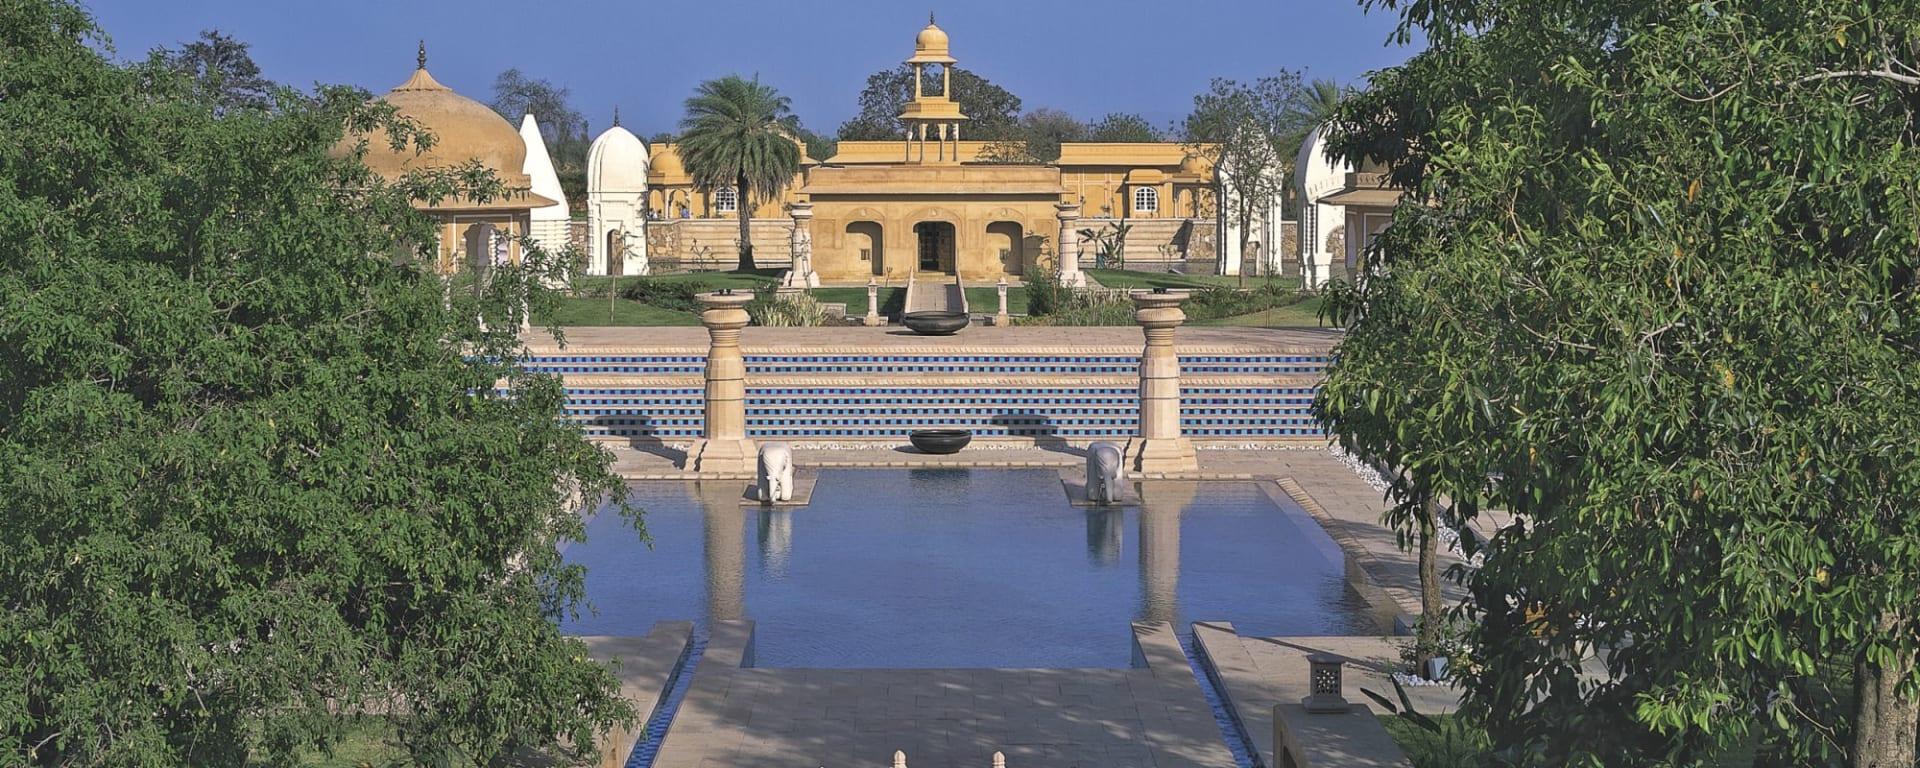 The Oberoi Rajvilas in Jaipur & Umgebung: The Oberoi Rajvilas